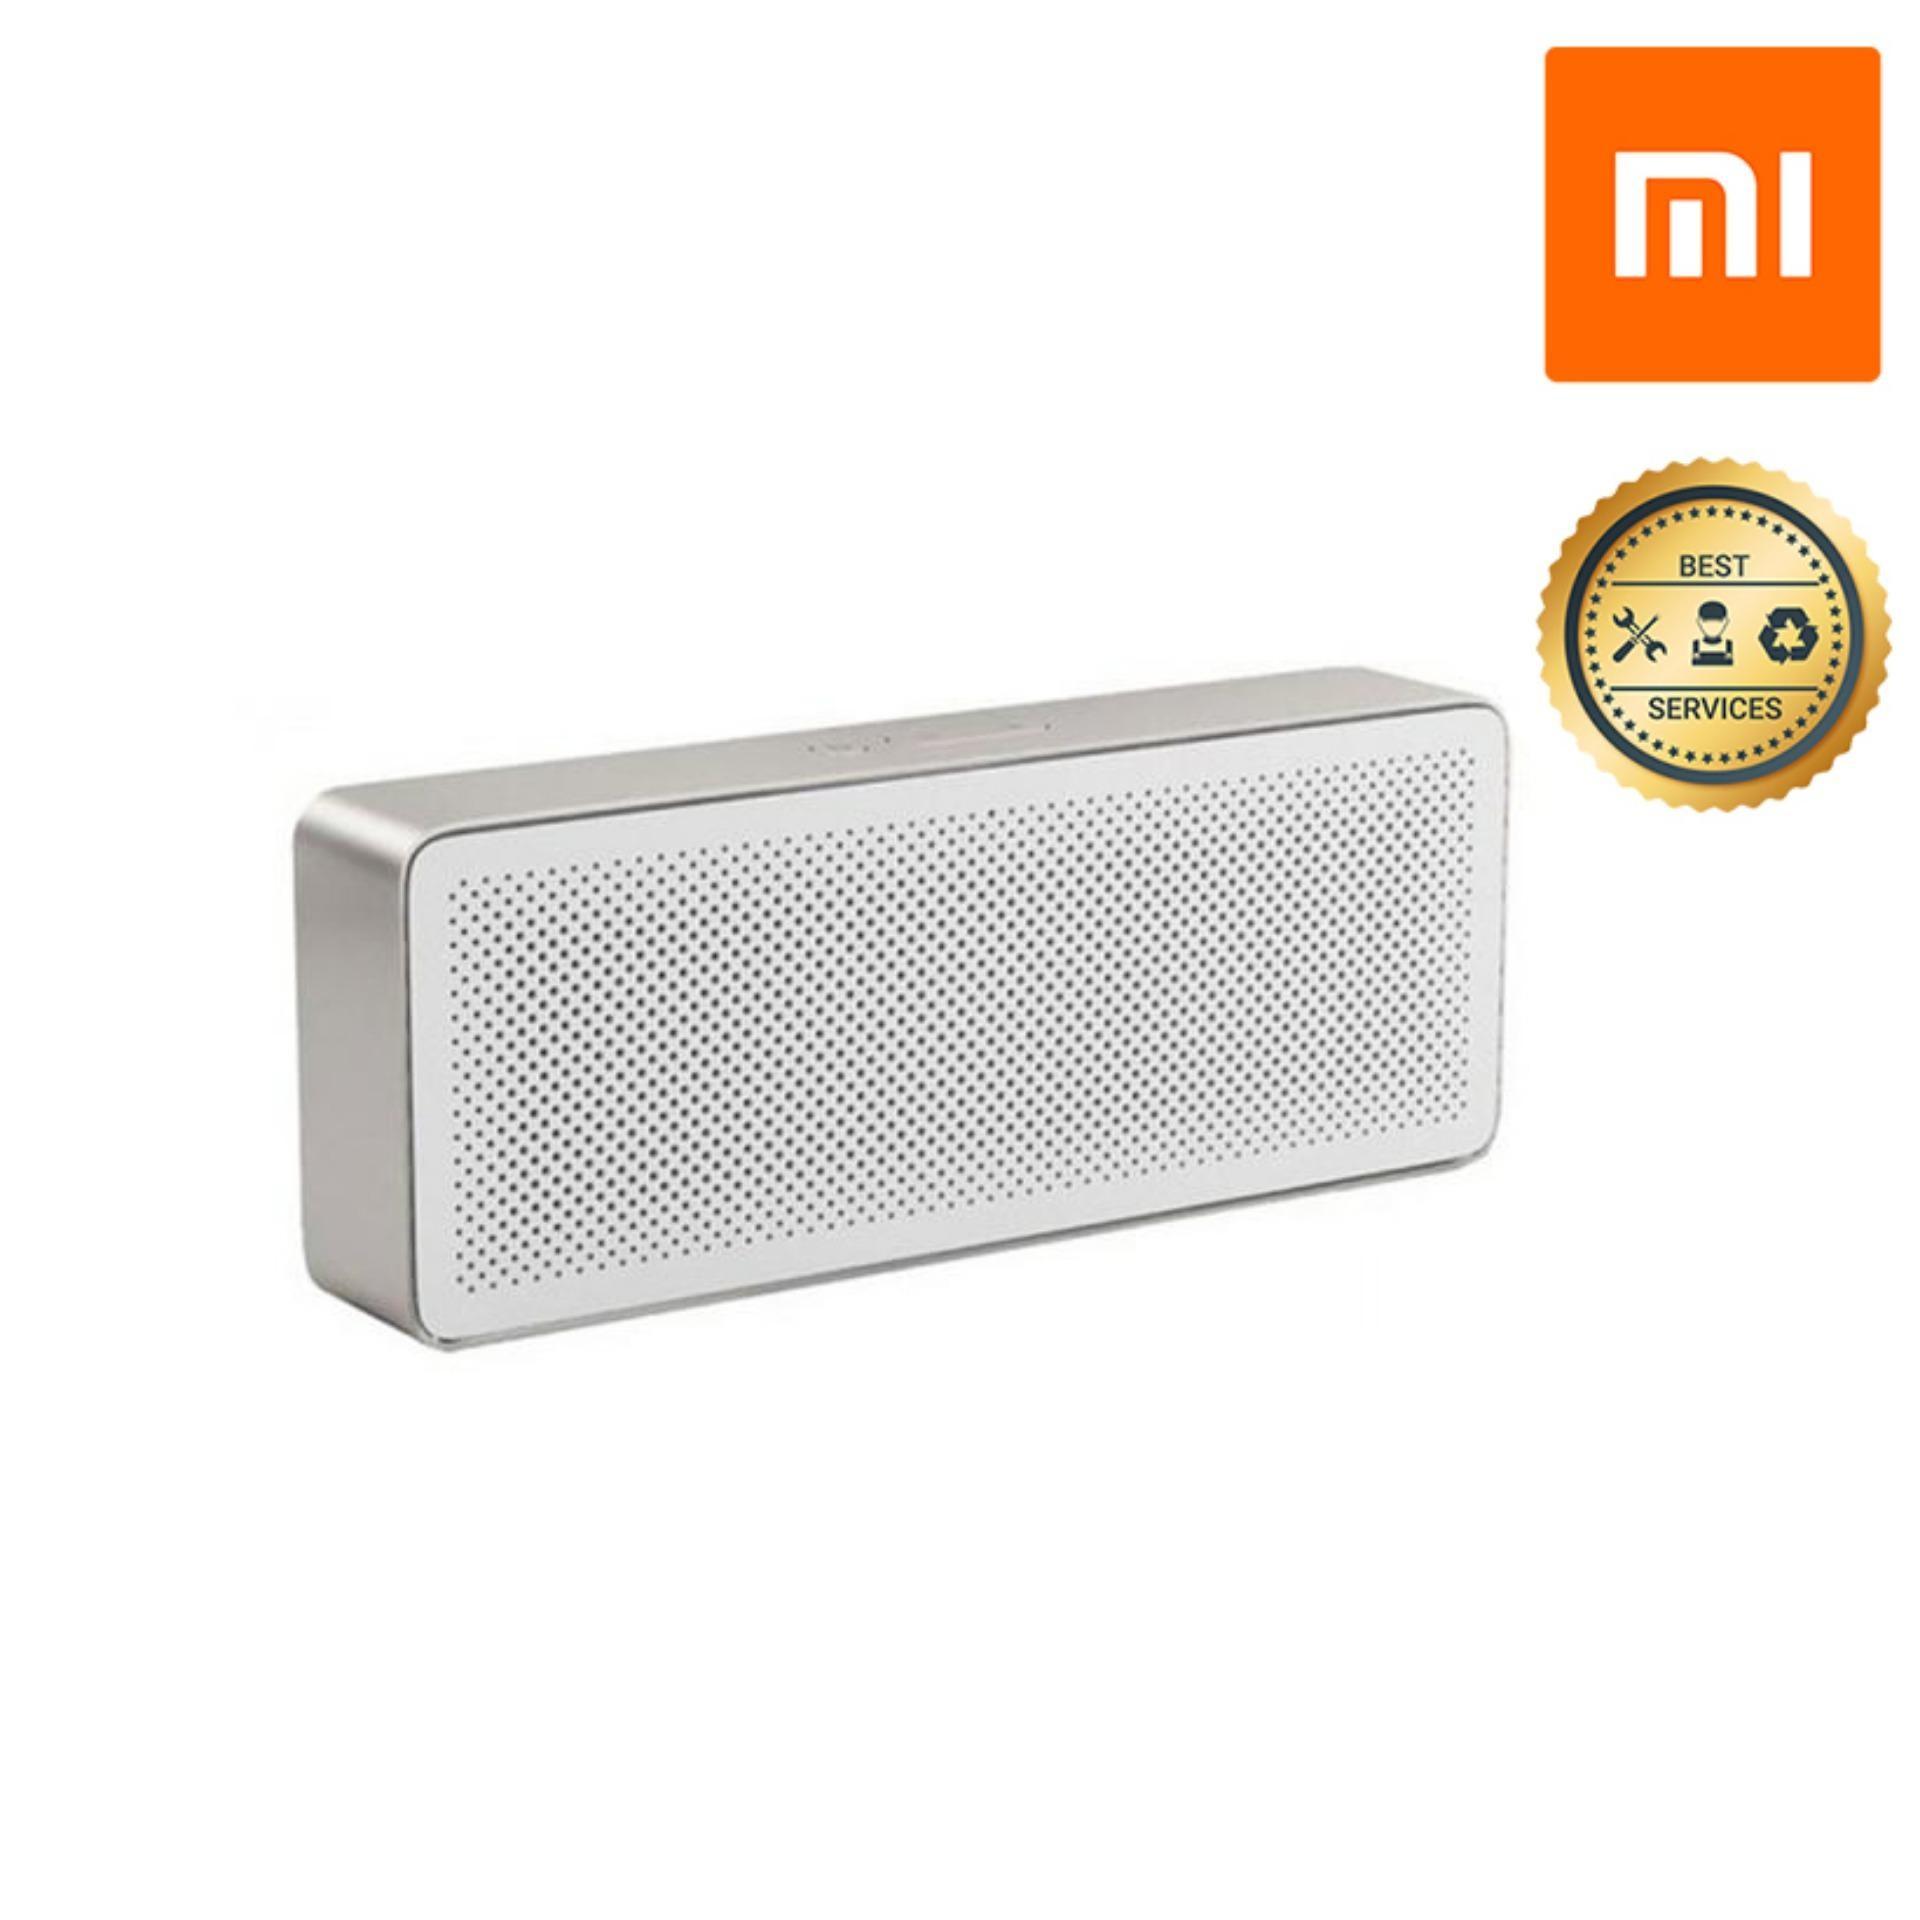 Loa nghe nhạc Xiaomi Mi Bluetooth Speaker Basic 2 - Trắng - FXR4066GL